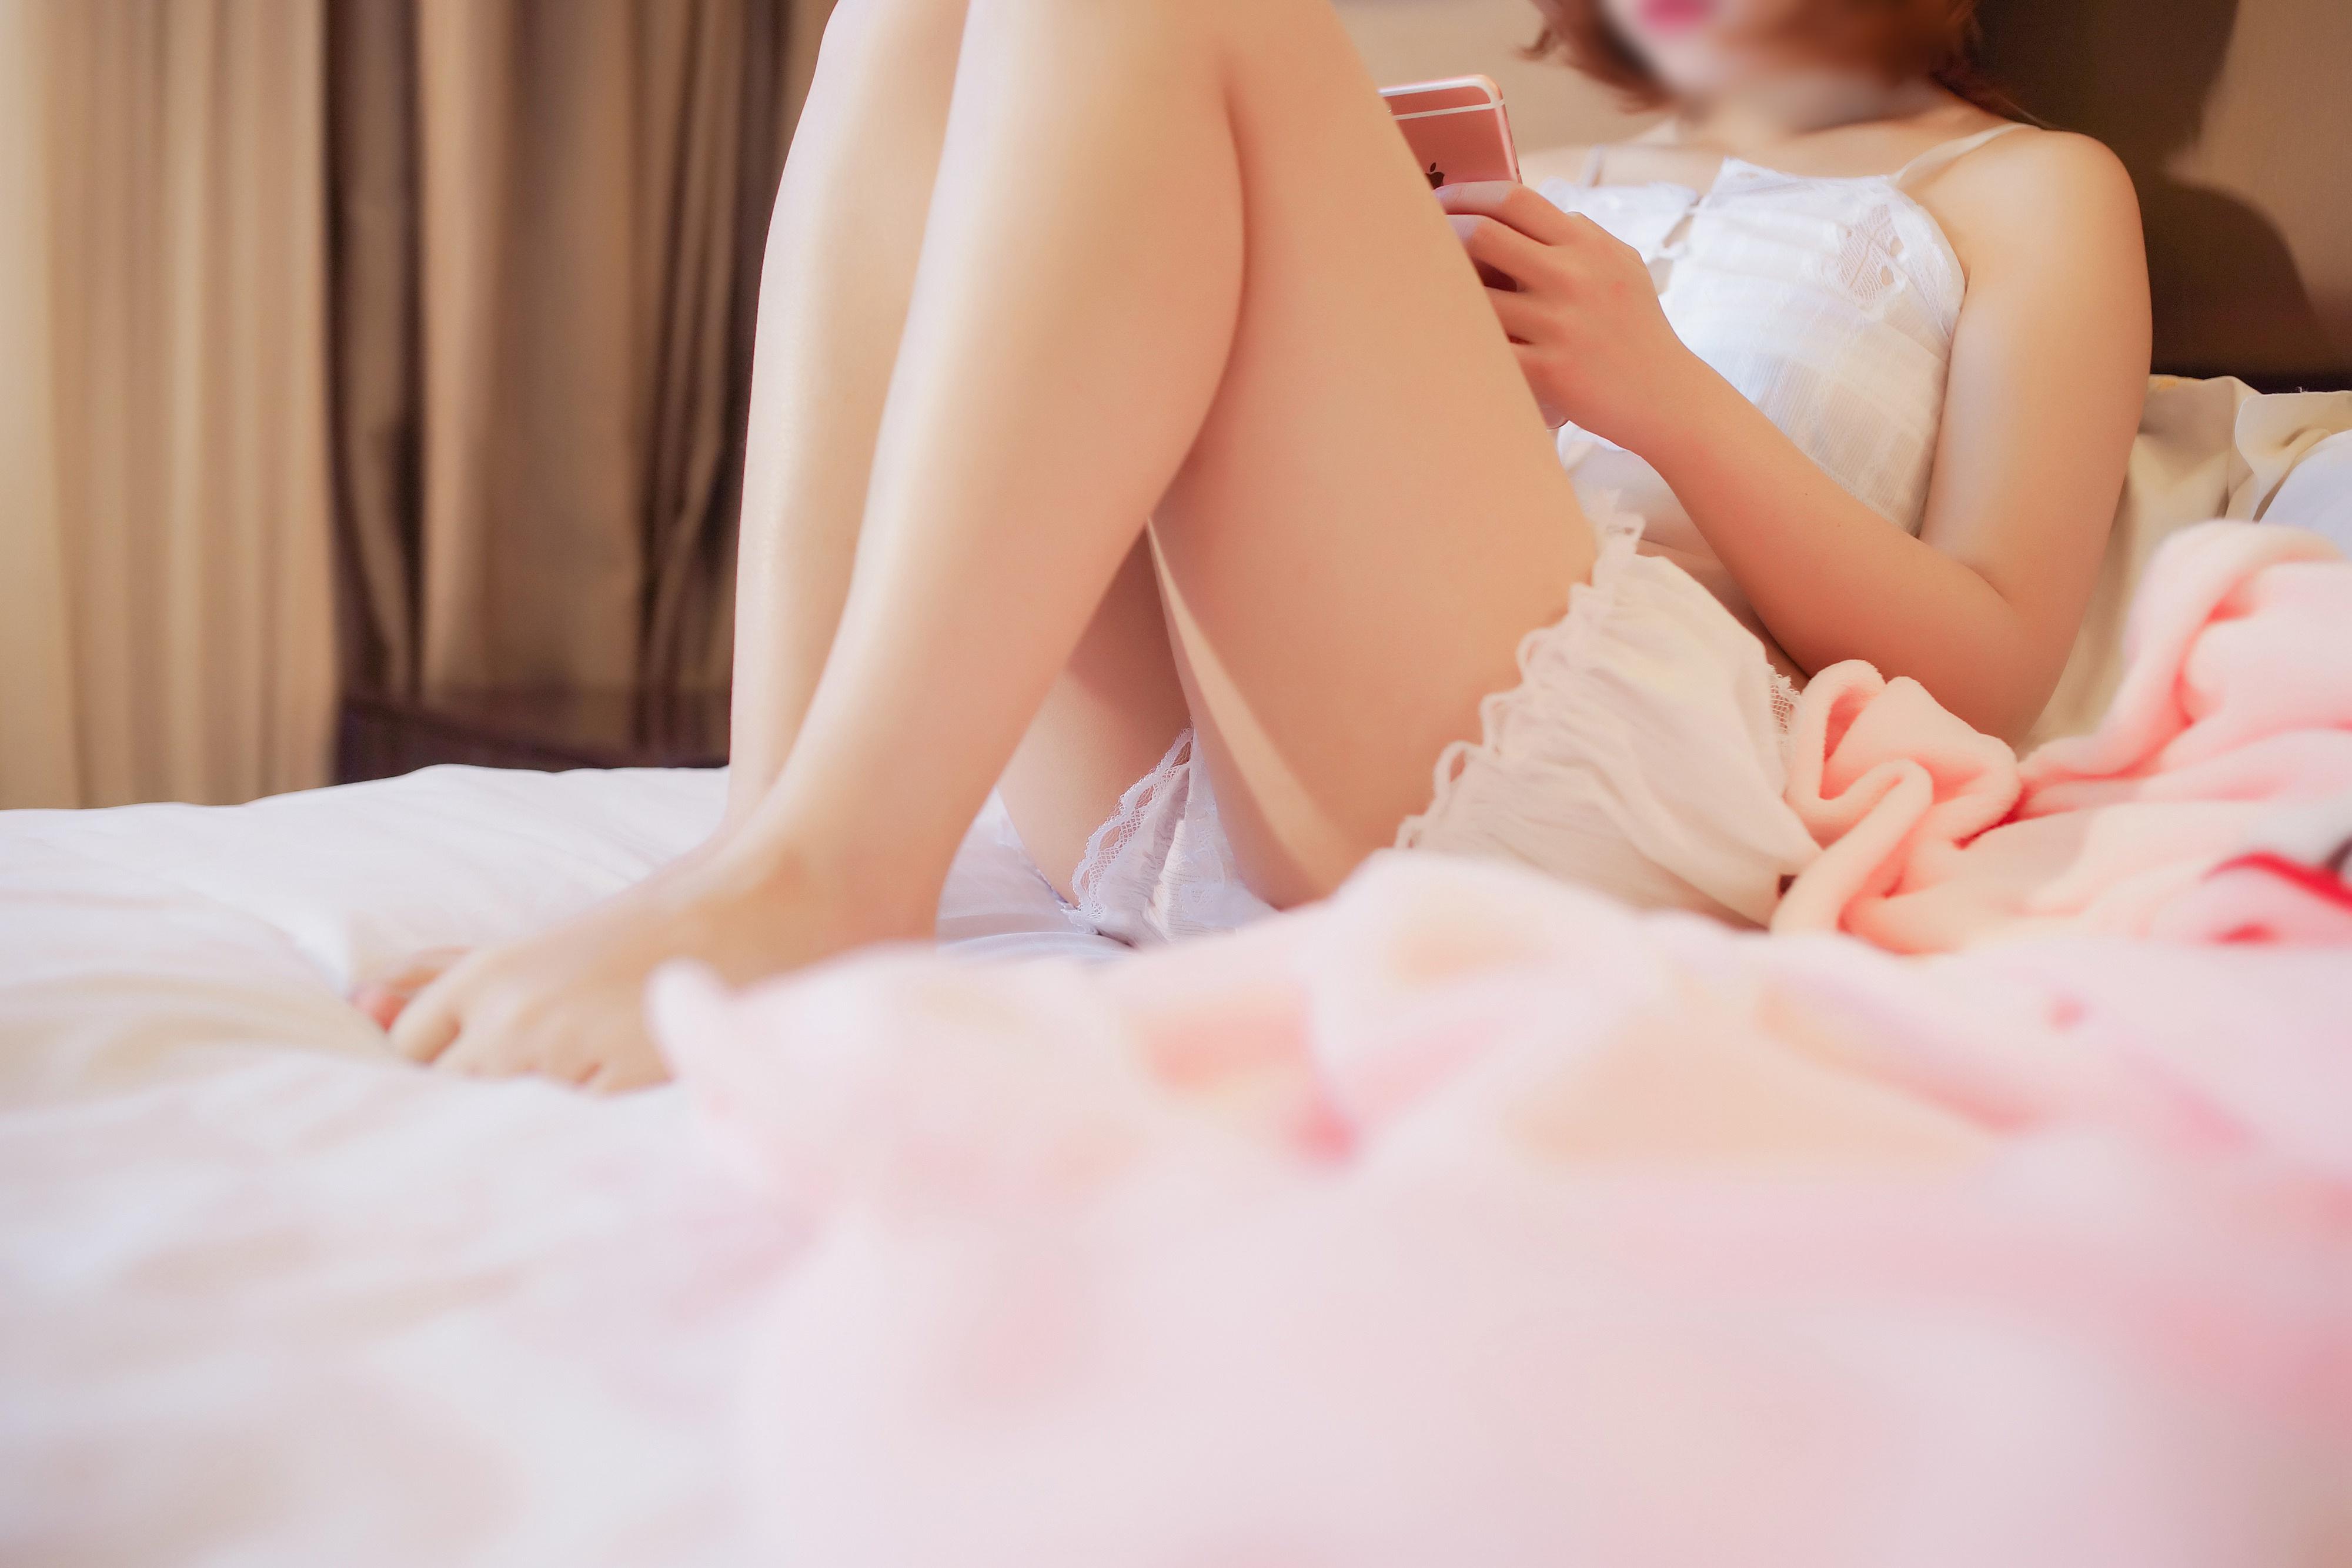 [Cosplay]映画系列之凯蒂猫睡袍 [96.4M]妹子图包 liuliushe.net六六社 第2张